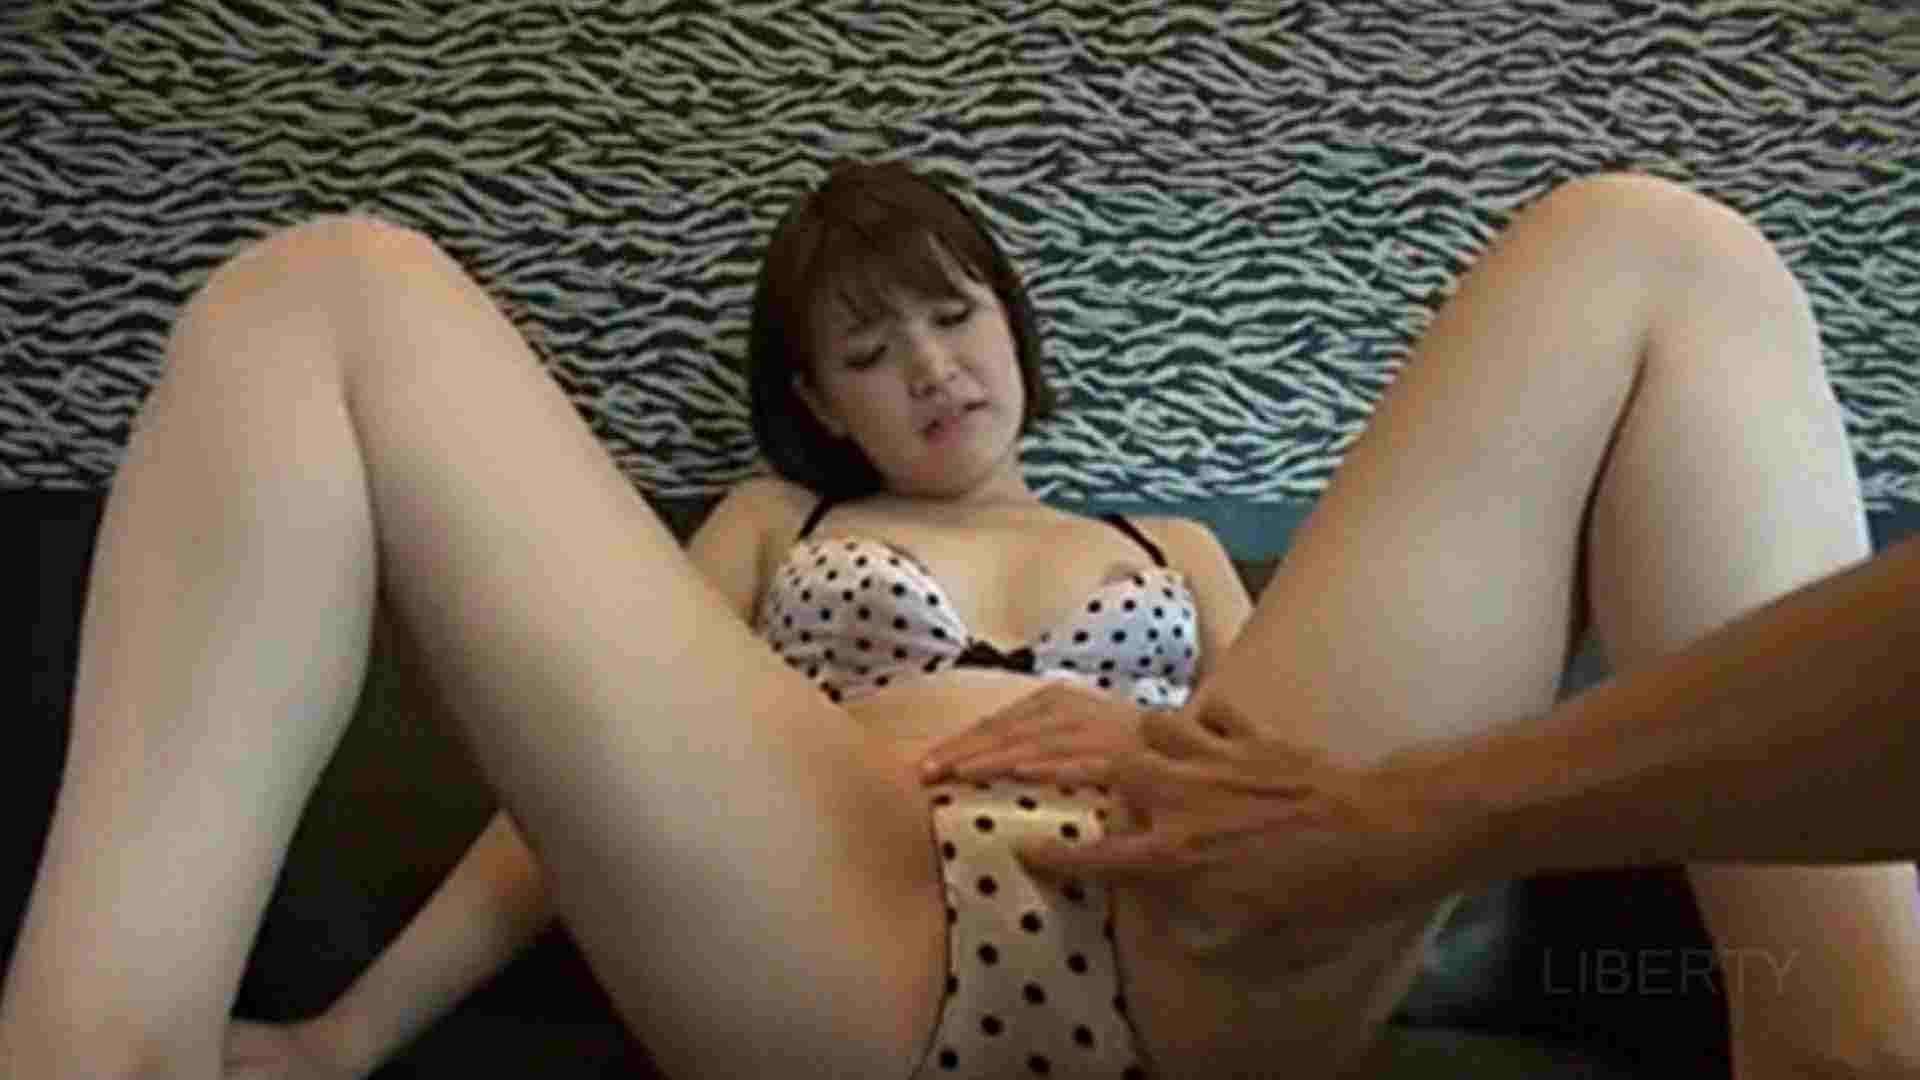 Hで可愛くてケシカラン! Vol.10 OL裸体 | 流出作品  63画像 30